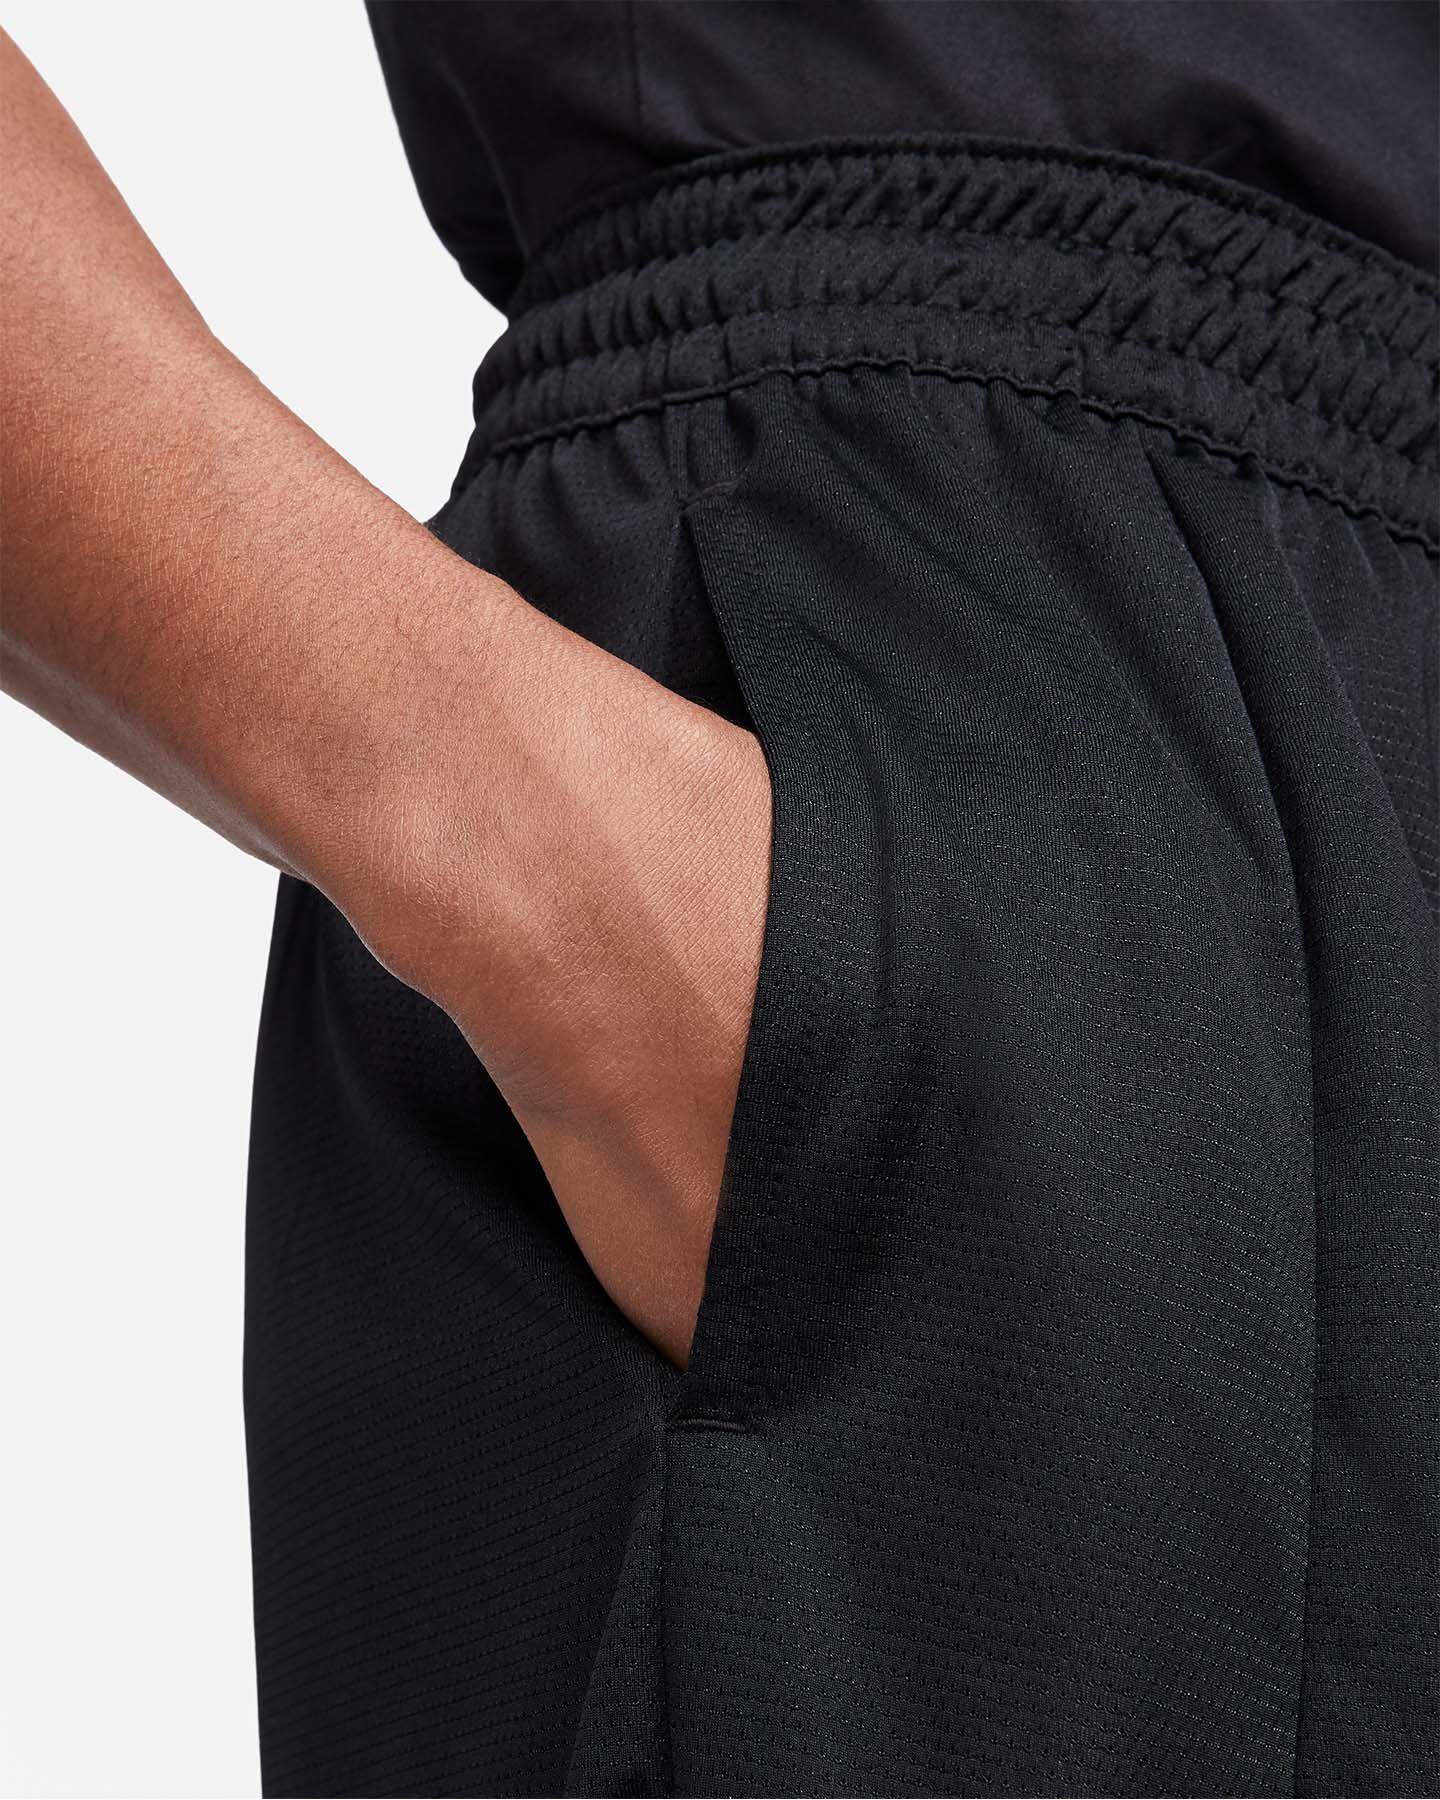 Pantaloncini basket NIKE DRY 2.0 M S5270199 scatto 3